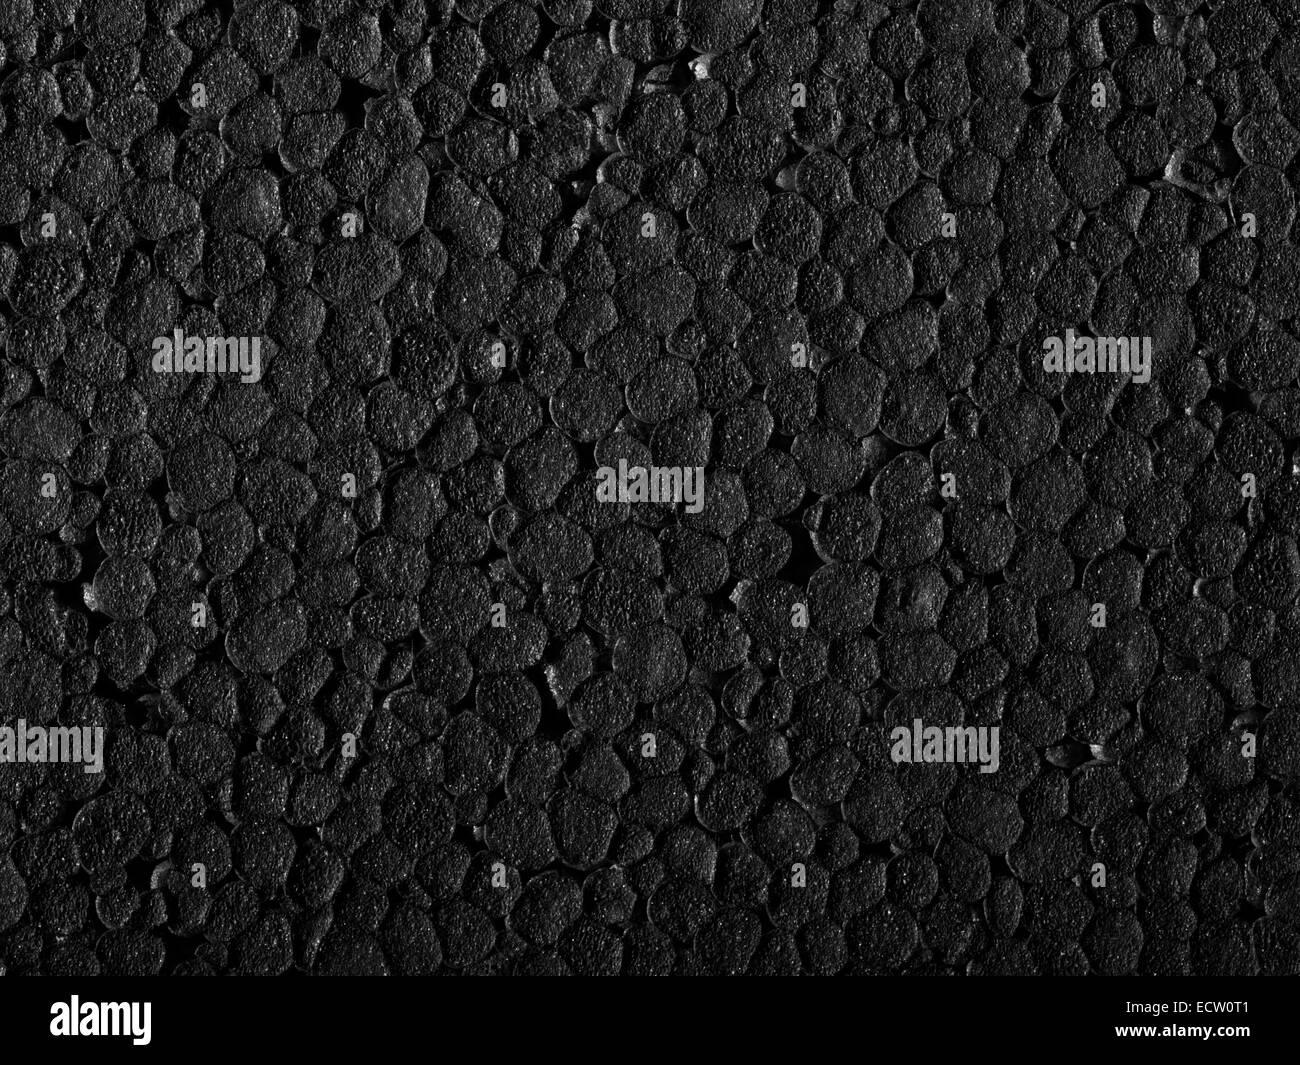 Full-Frame-Nahaufnahme einer schwarzen Polystyrol-Oberfläche Stockbild